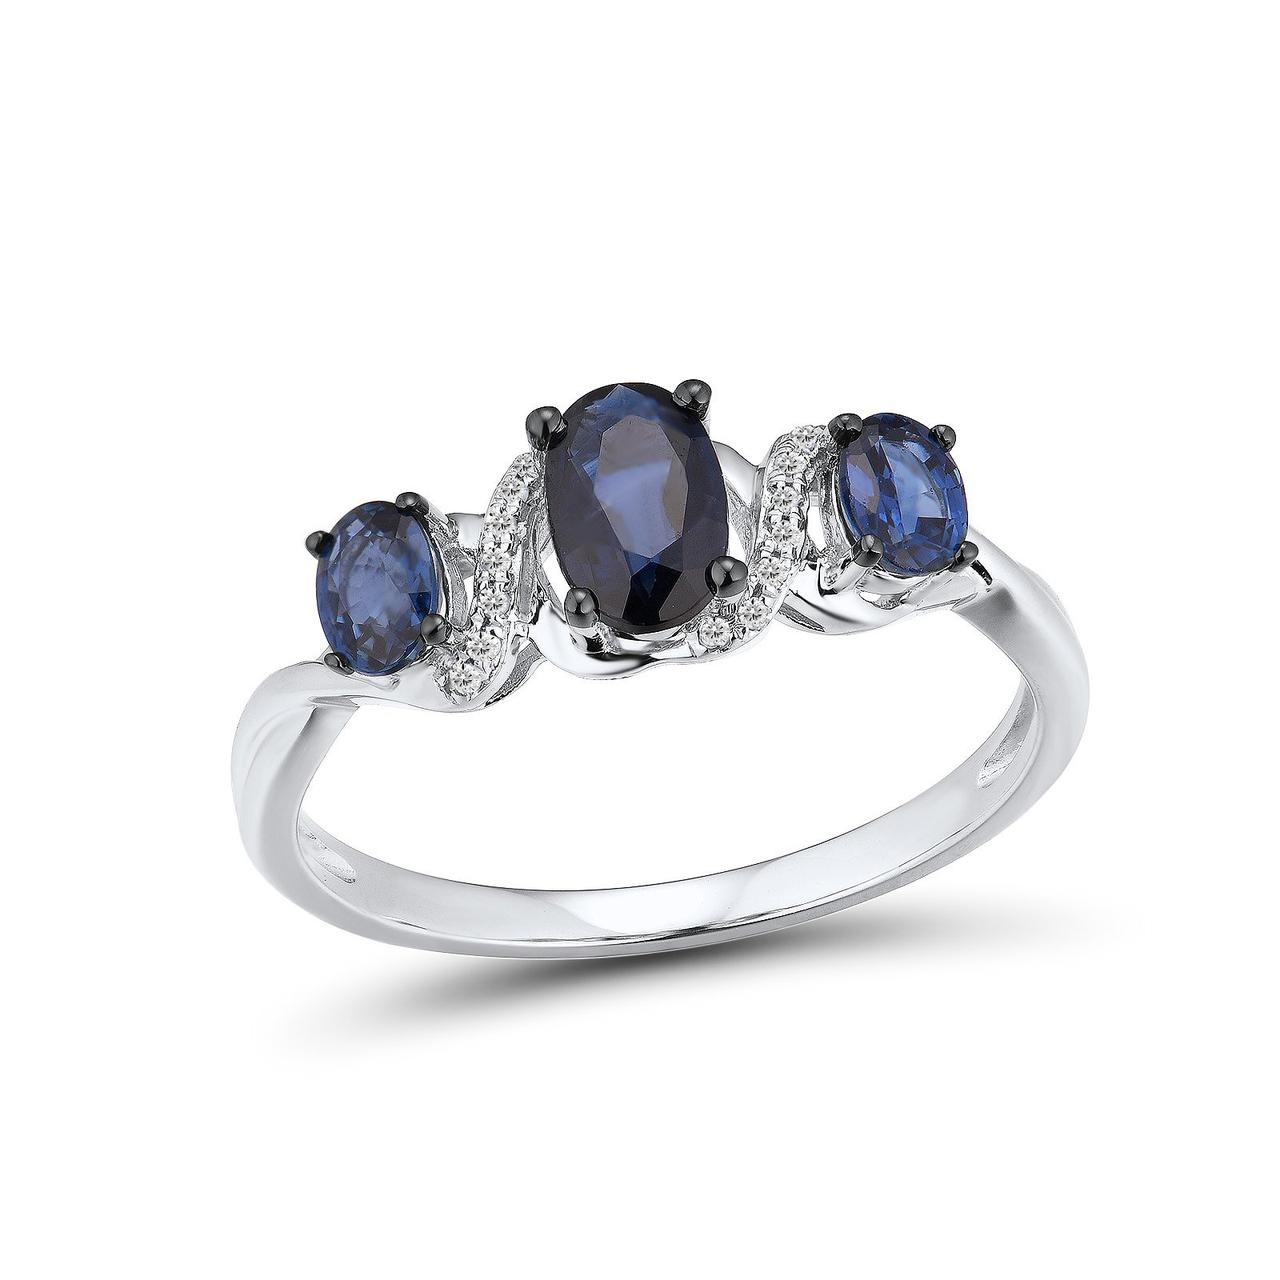 Золотое кольцо с бриллиантами и сапфирами, размер 17 (1681416)